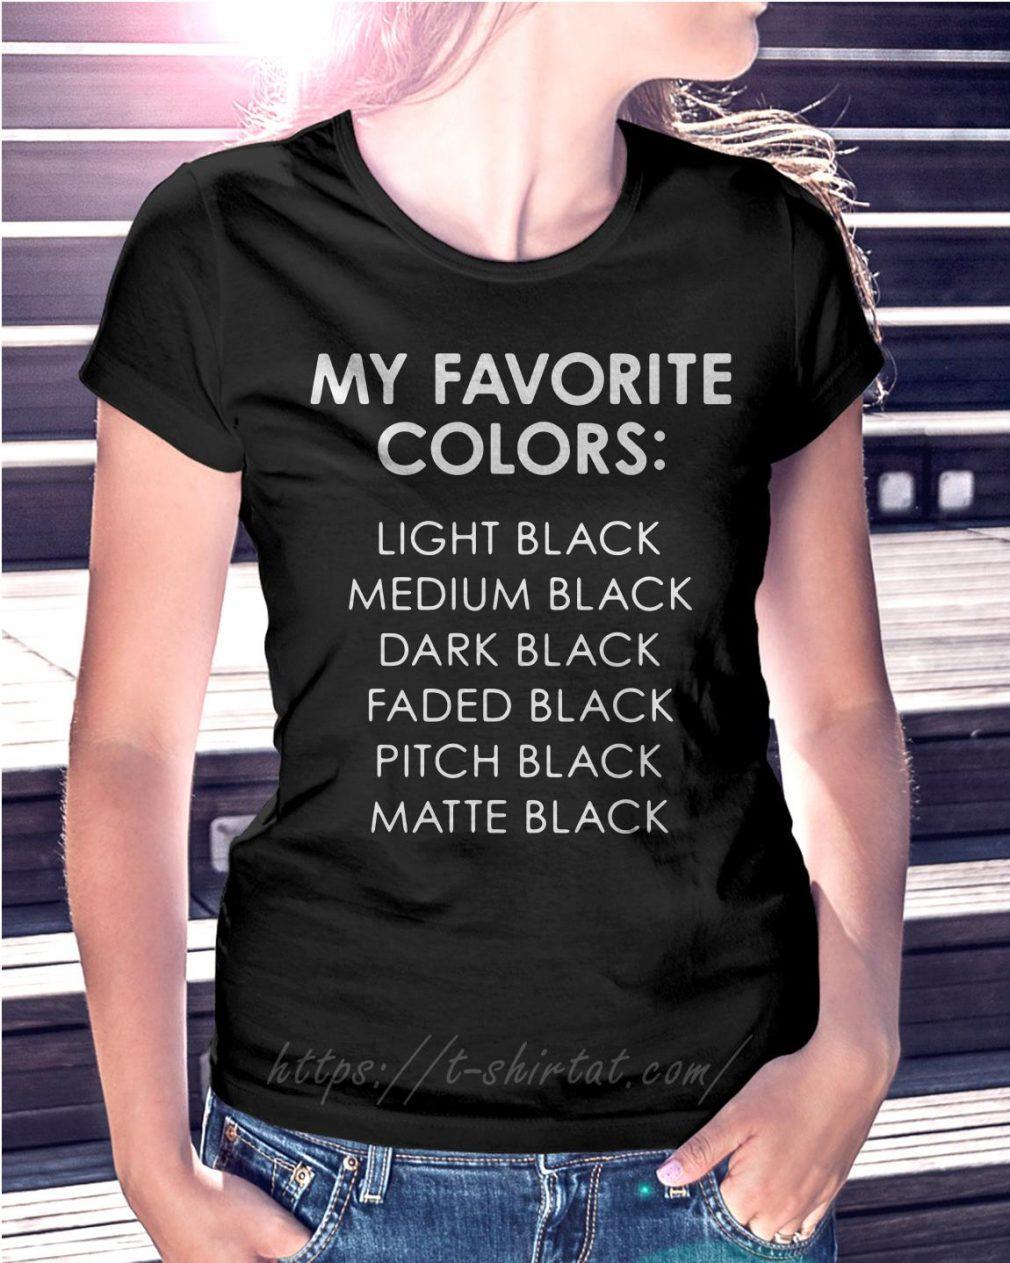 My favorite colors light black medium black dark black faded black pitch black